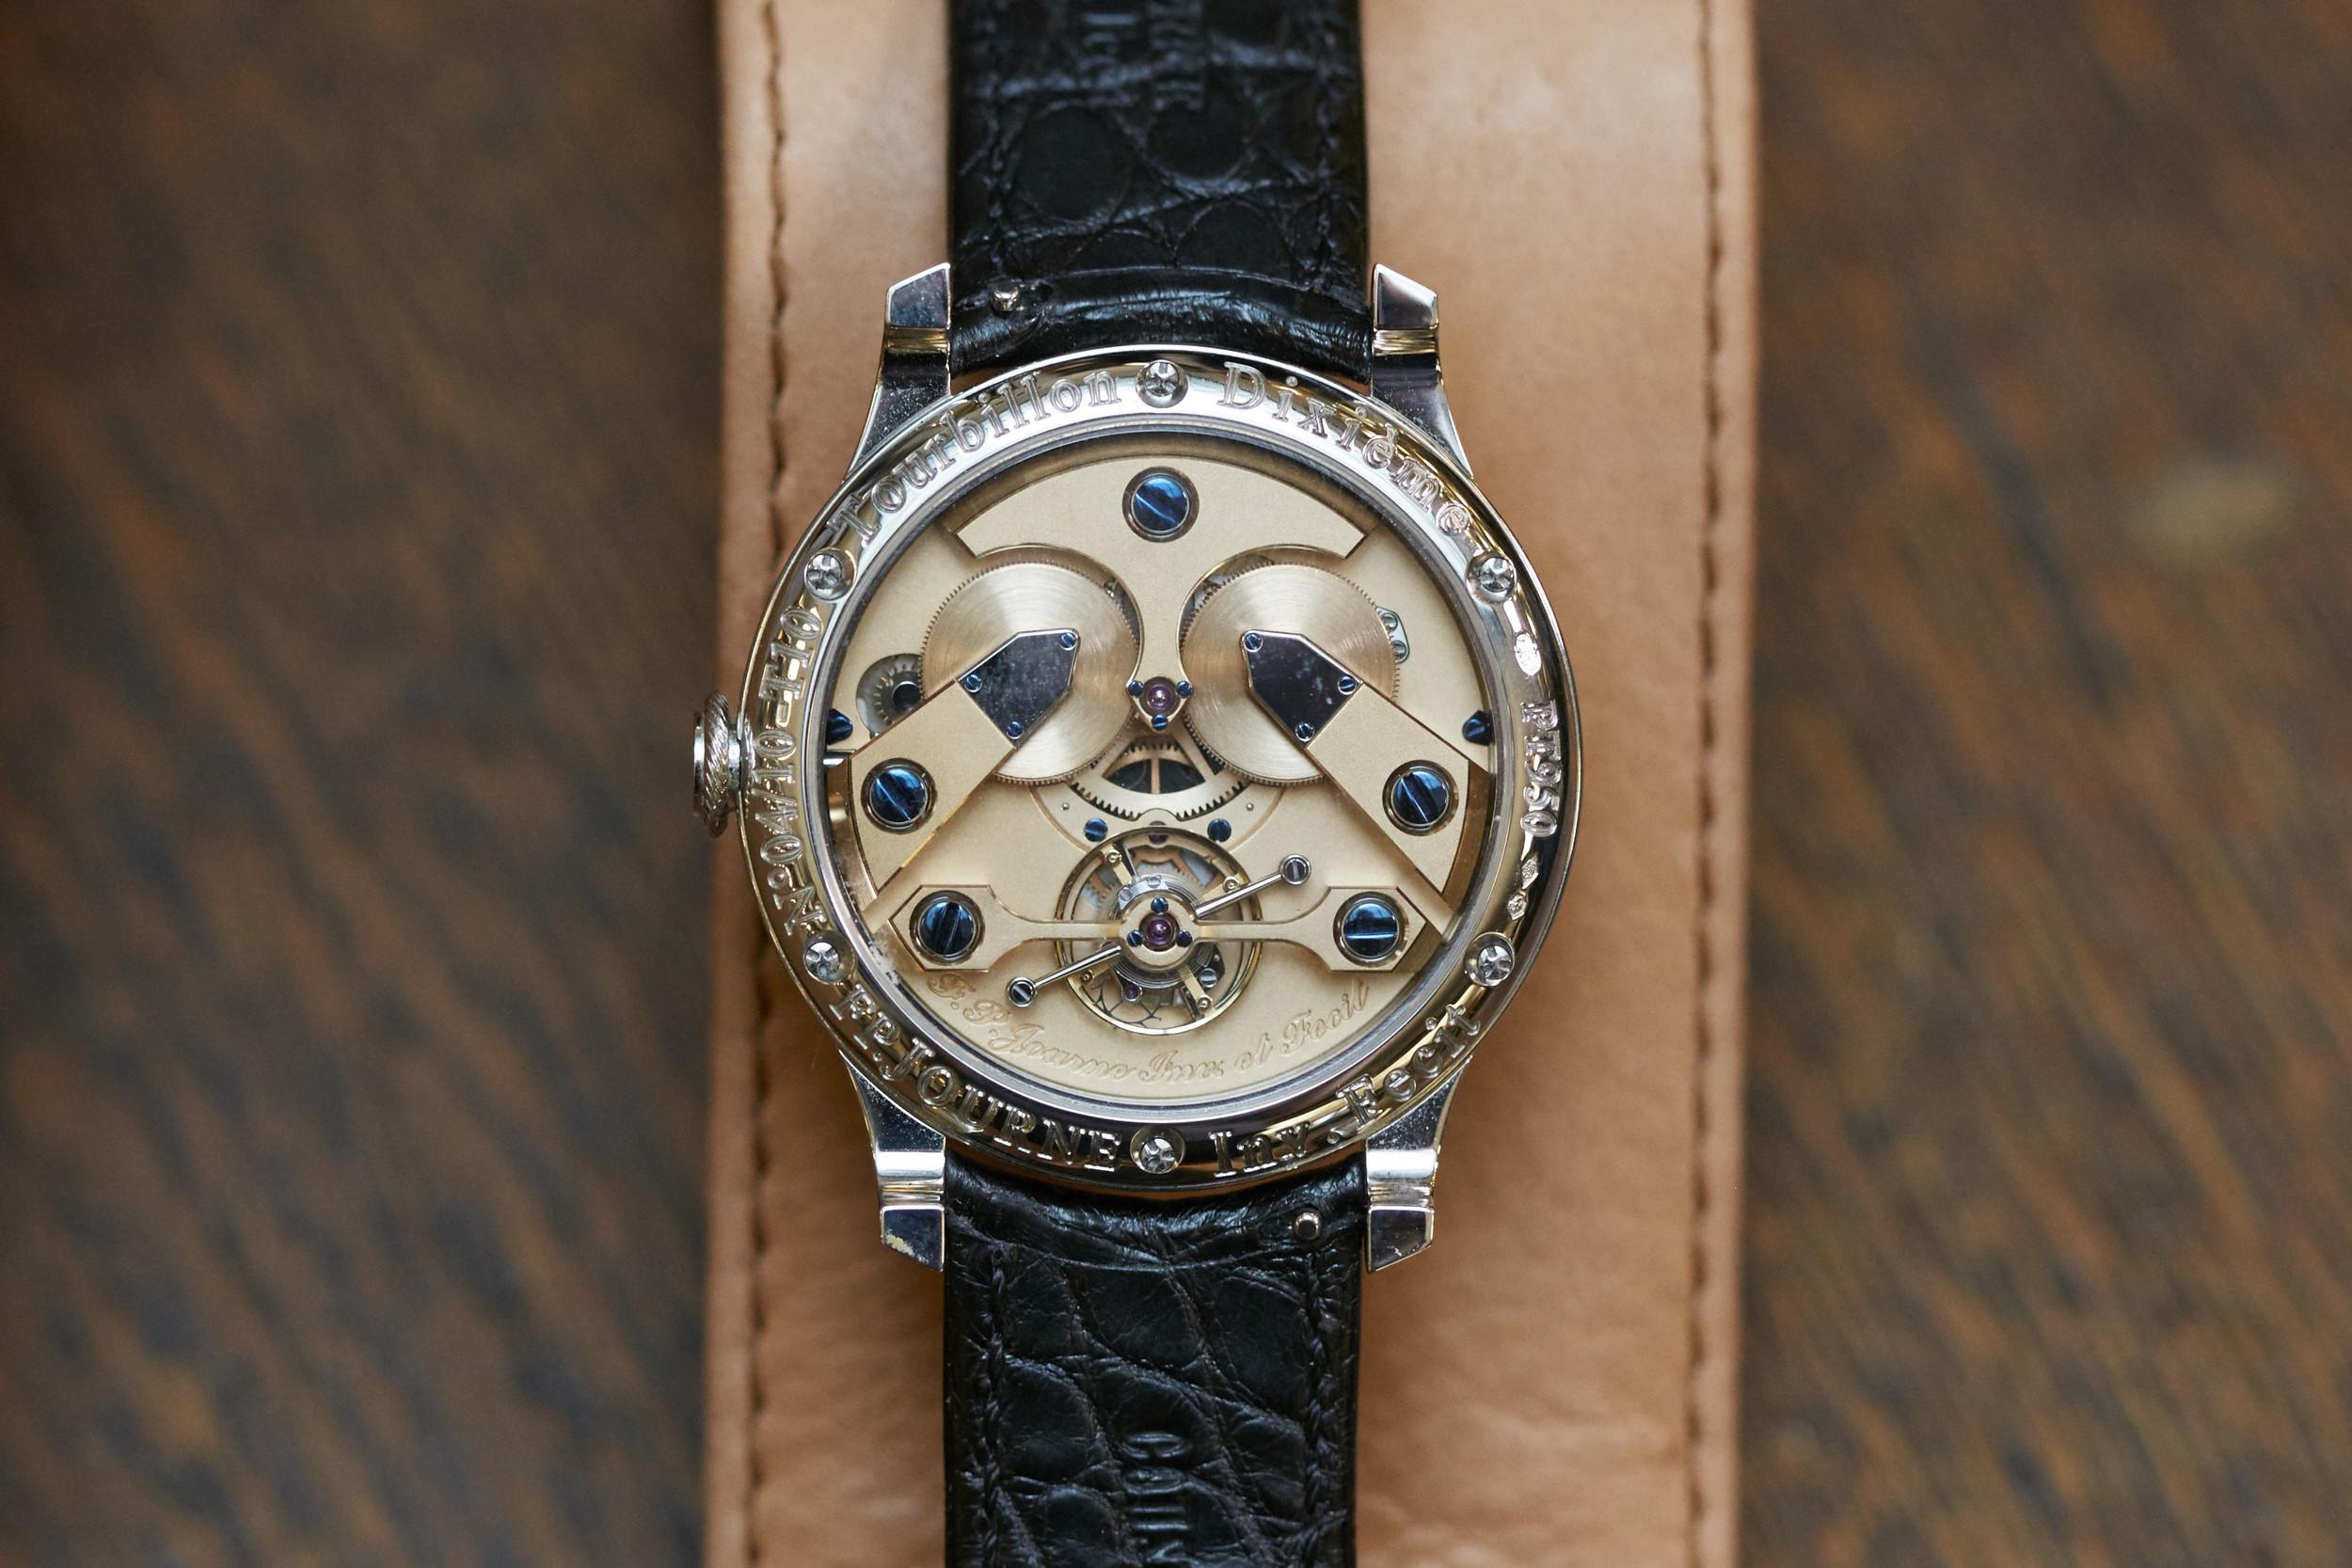 Movement of the F.P. Journe T10 Tourbillon Wristwatch